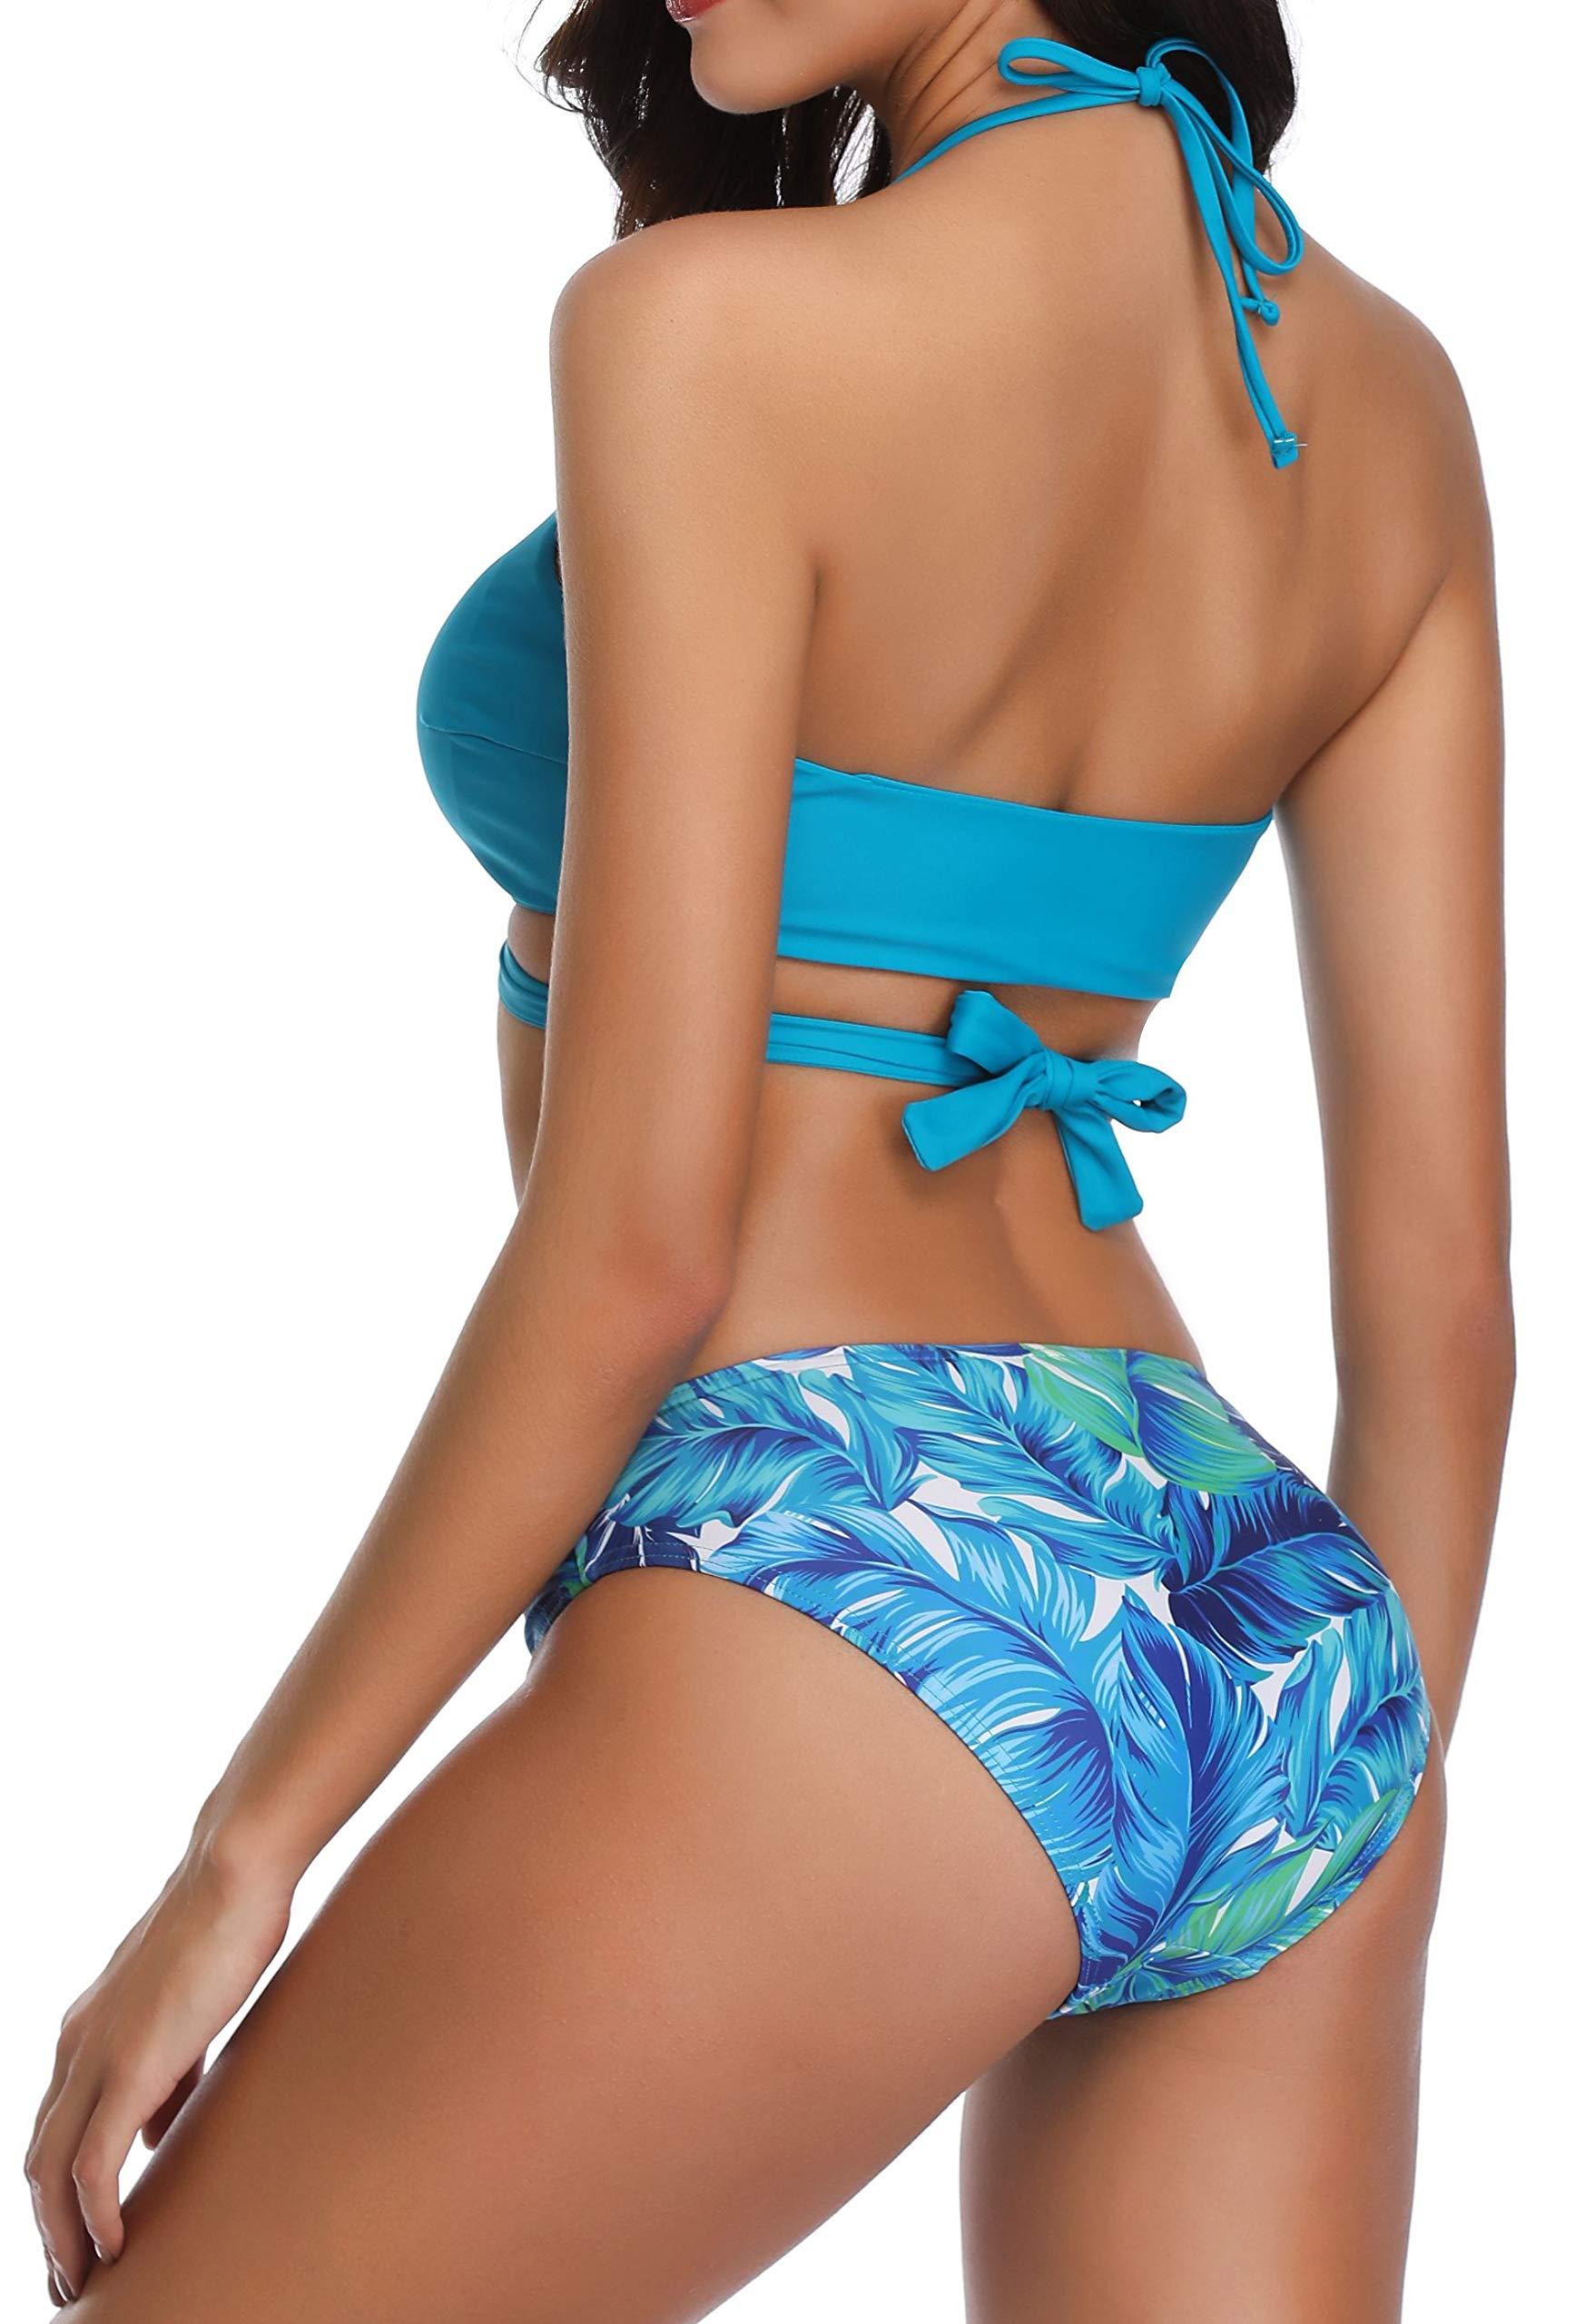 Women Halter Bandage Bikini Set Padded Push Up Two Pieces Swimsuit Bathing Suit Green M